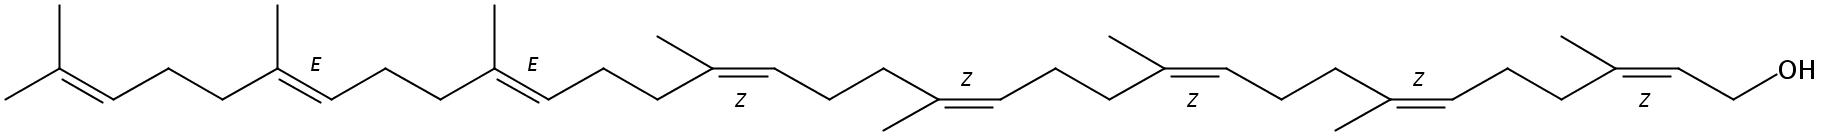 Structural formula of Octaprenol